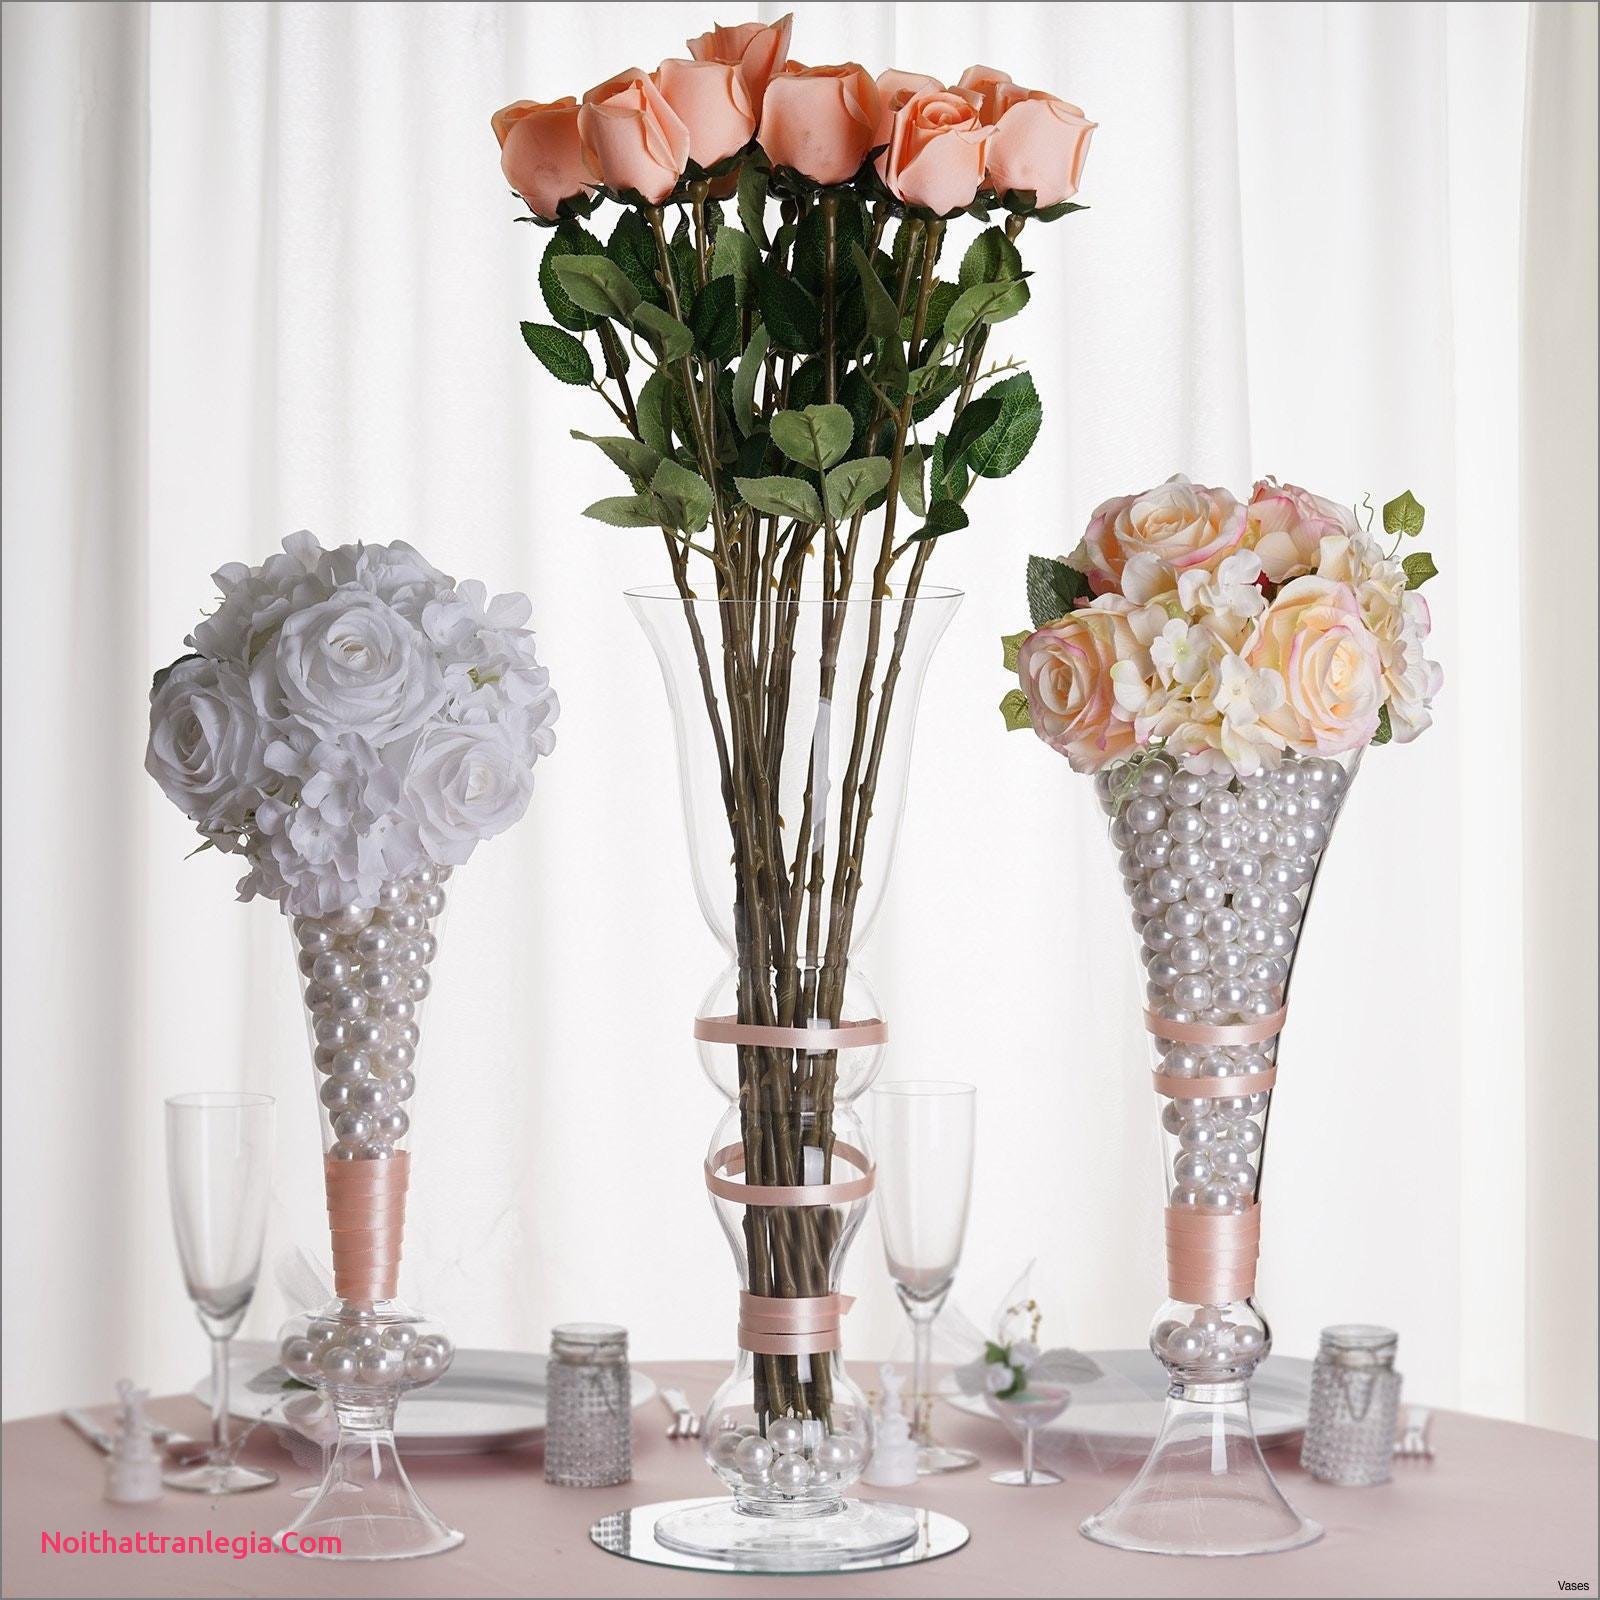 Floor vase clipart svg transparent stock 29 Ideal Tall Brown Floor Vases | Decorative vase Ideas svg transparent stock